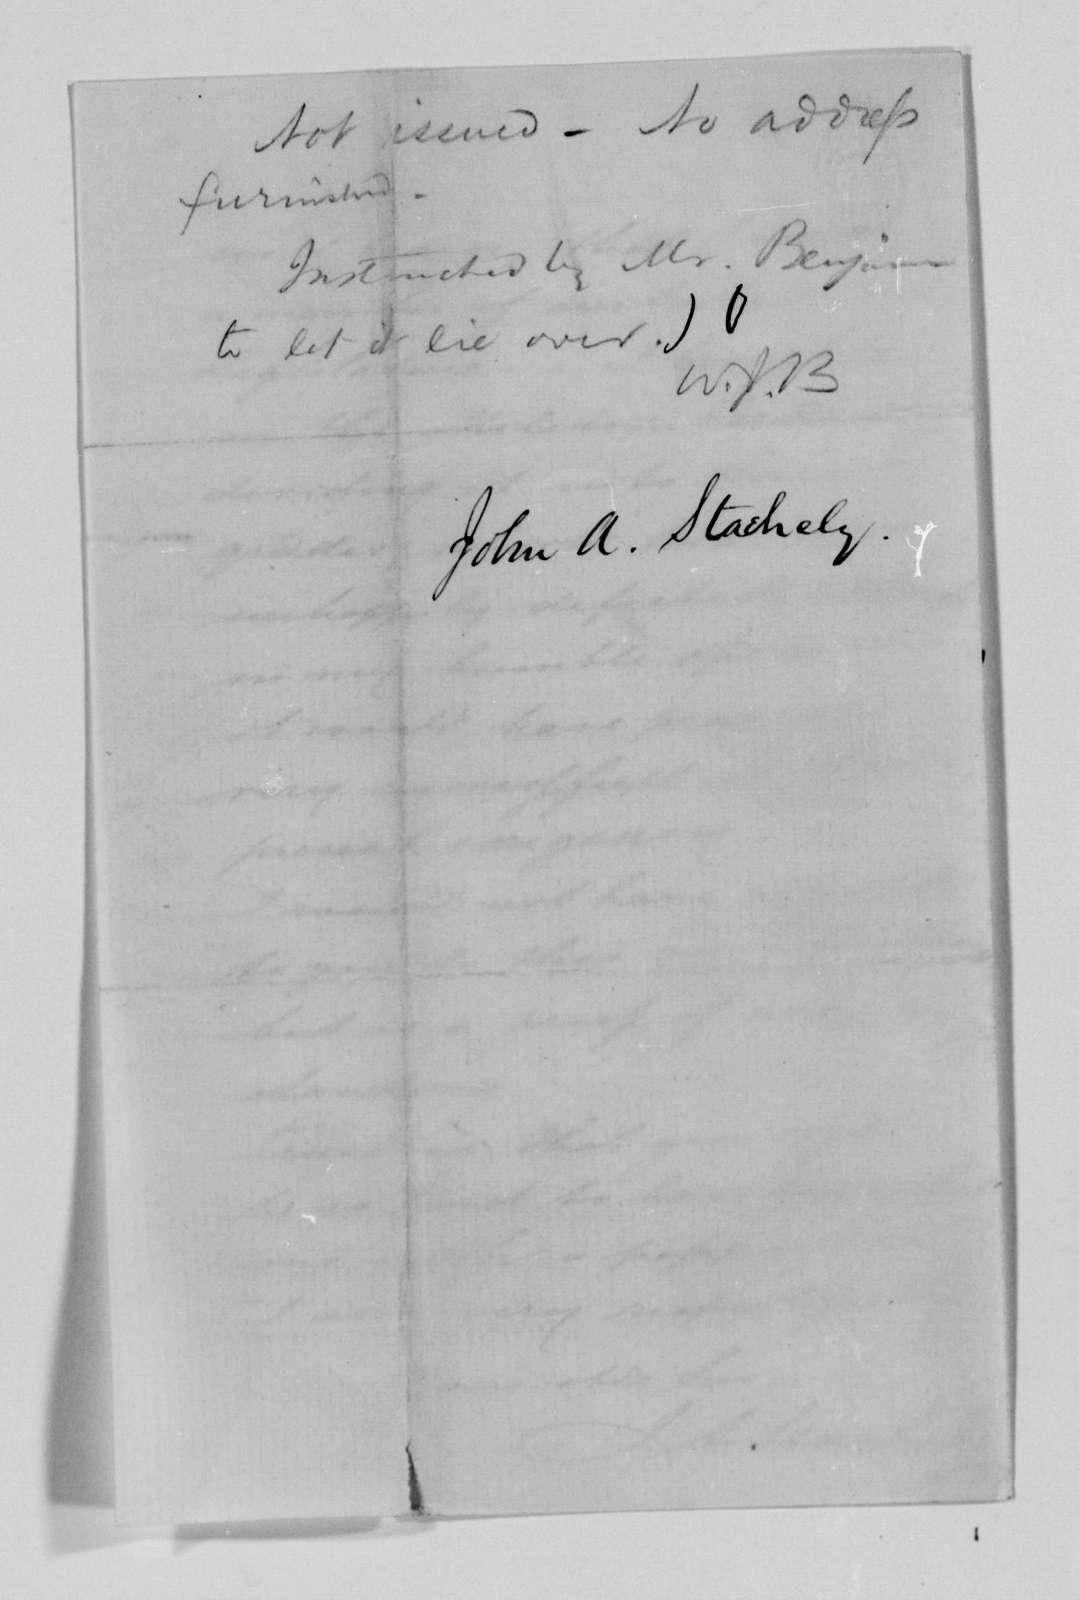 Confederate States of America records: Microfilm Reel 20